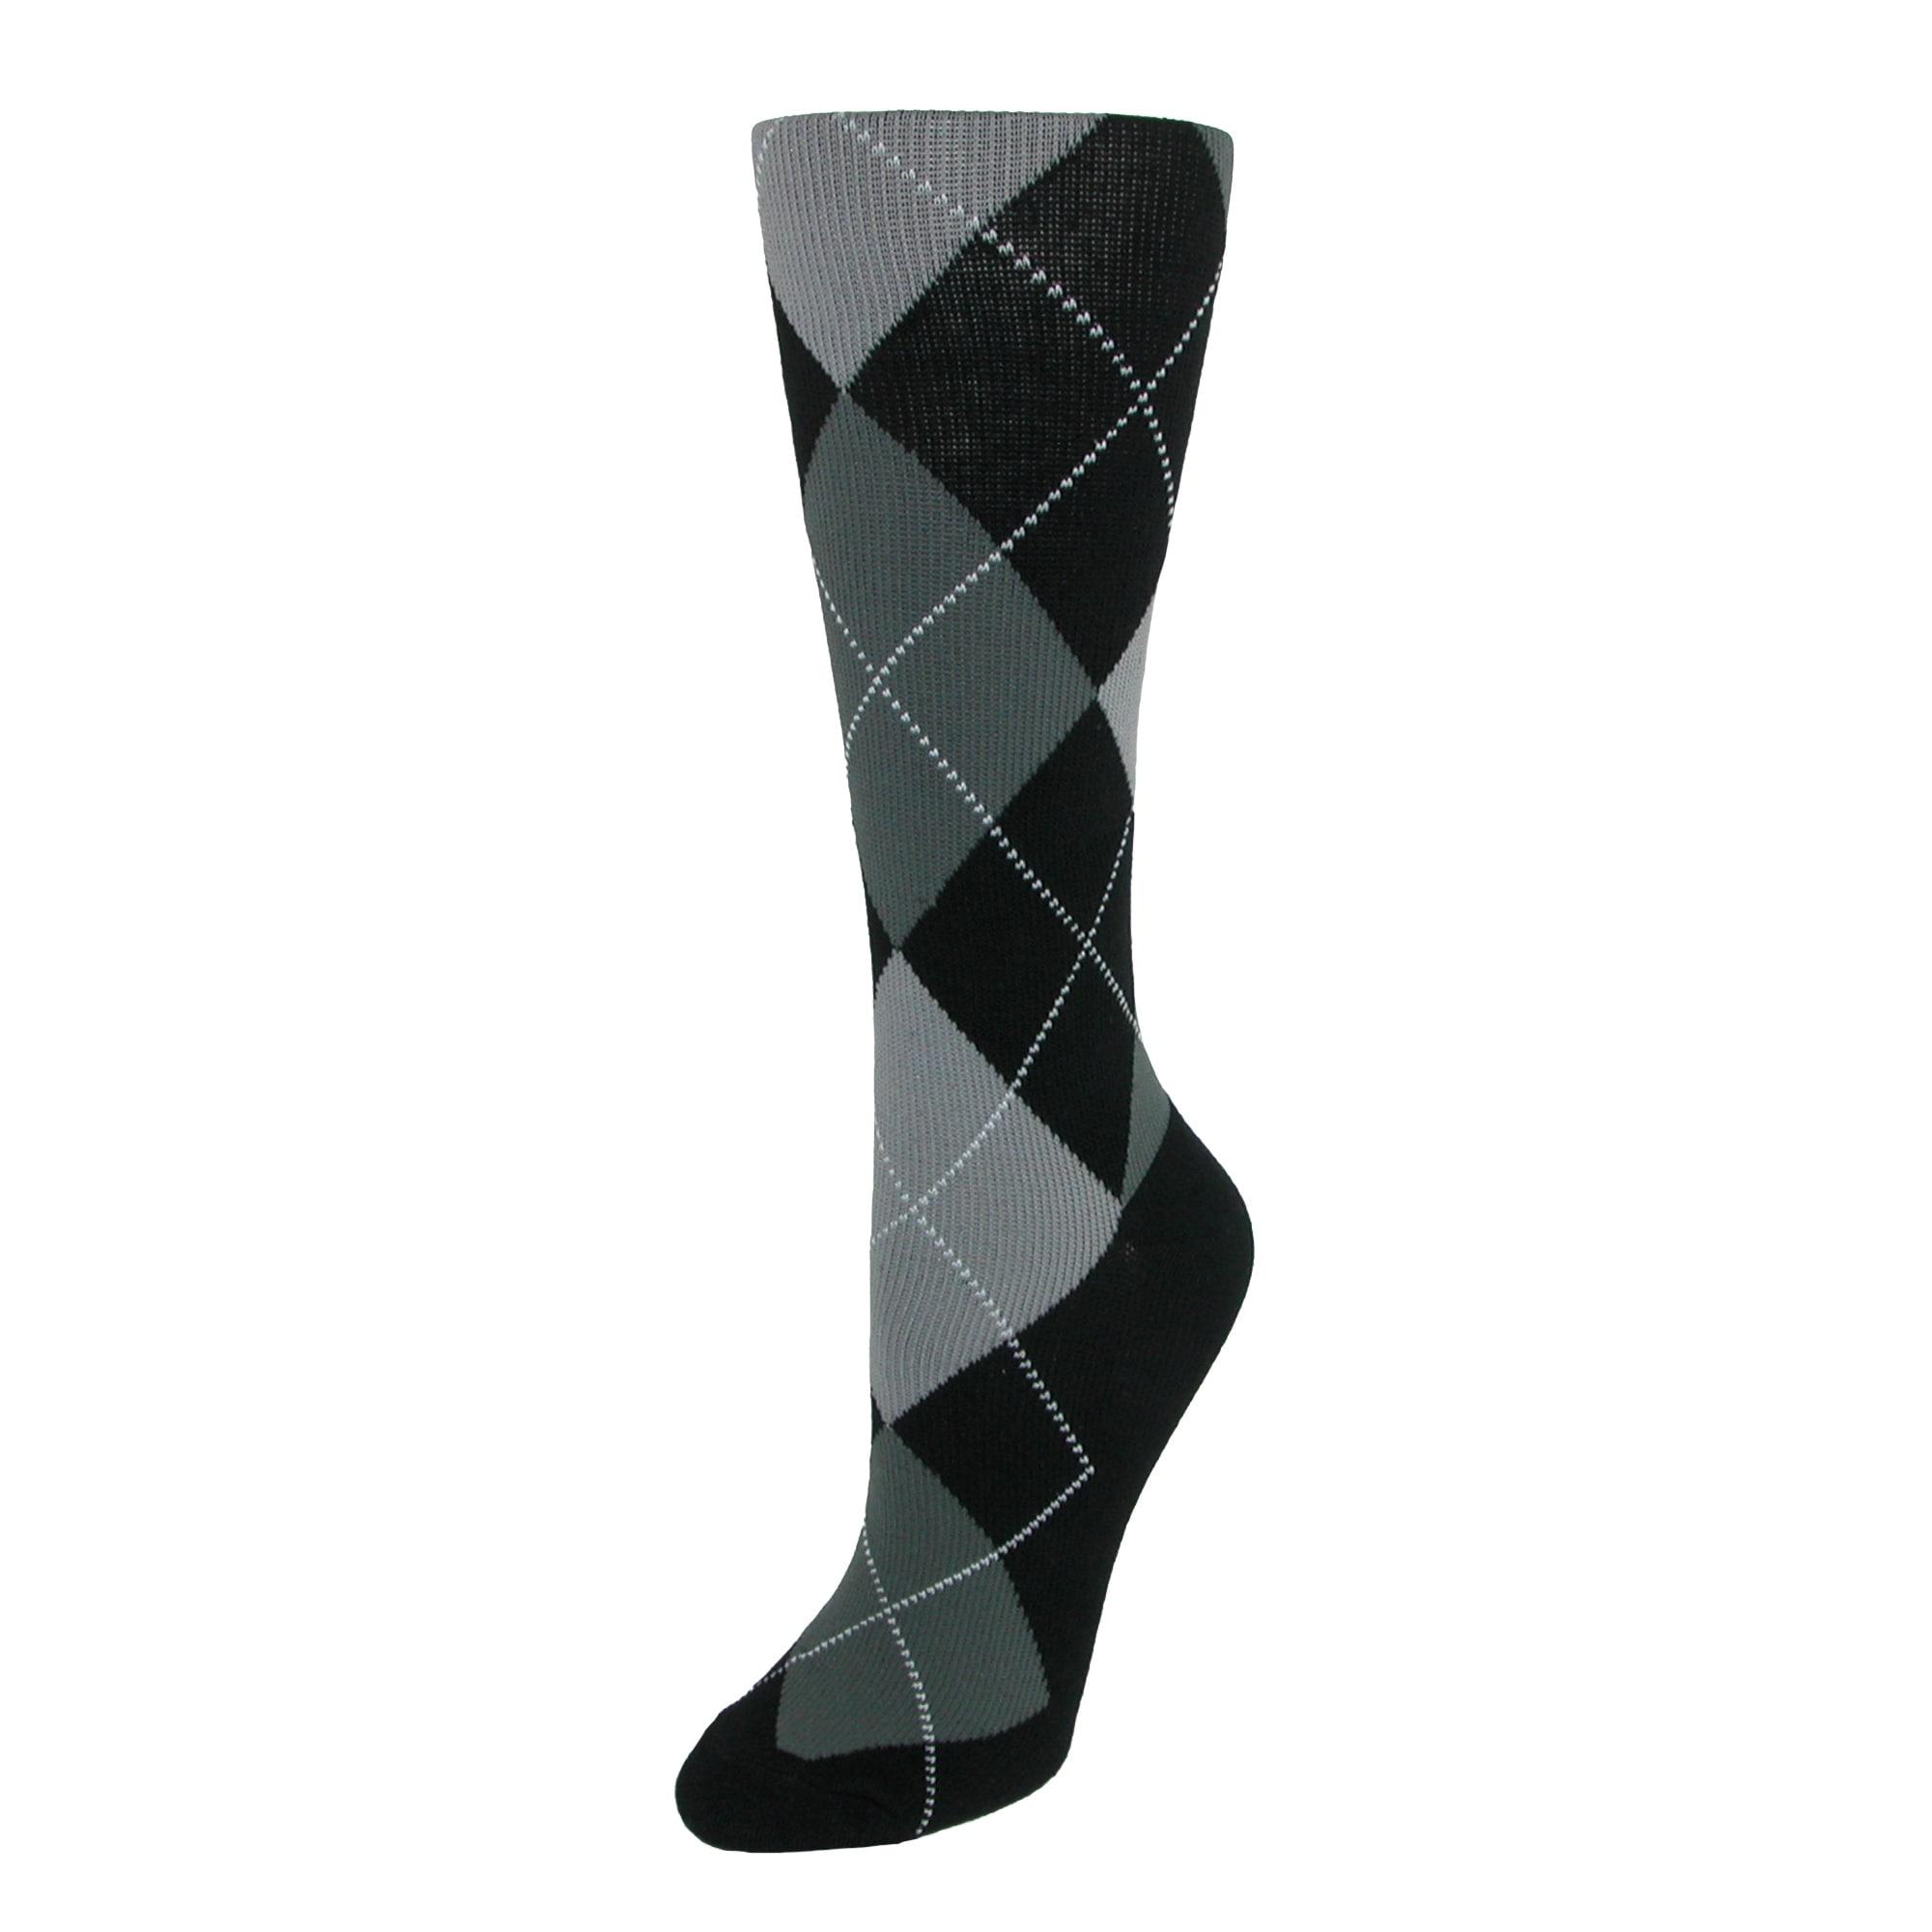 a16039e728 Shop Fine Fit Women's Argyle Compression Socks - Free Shipping On ...